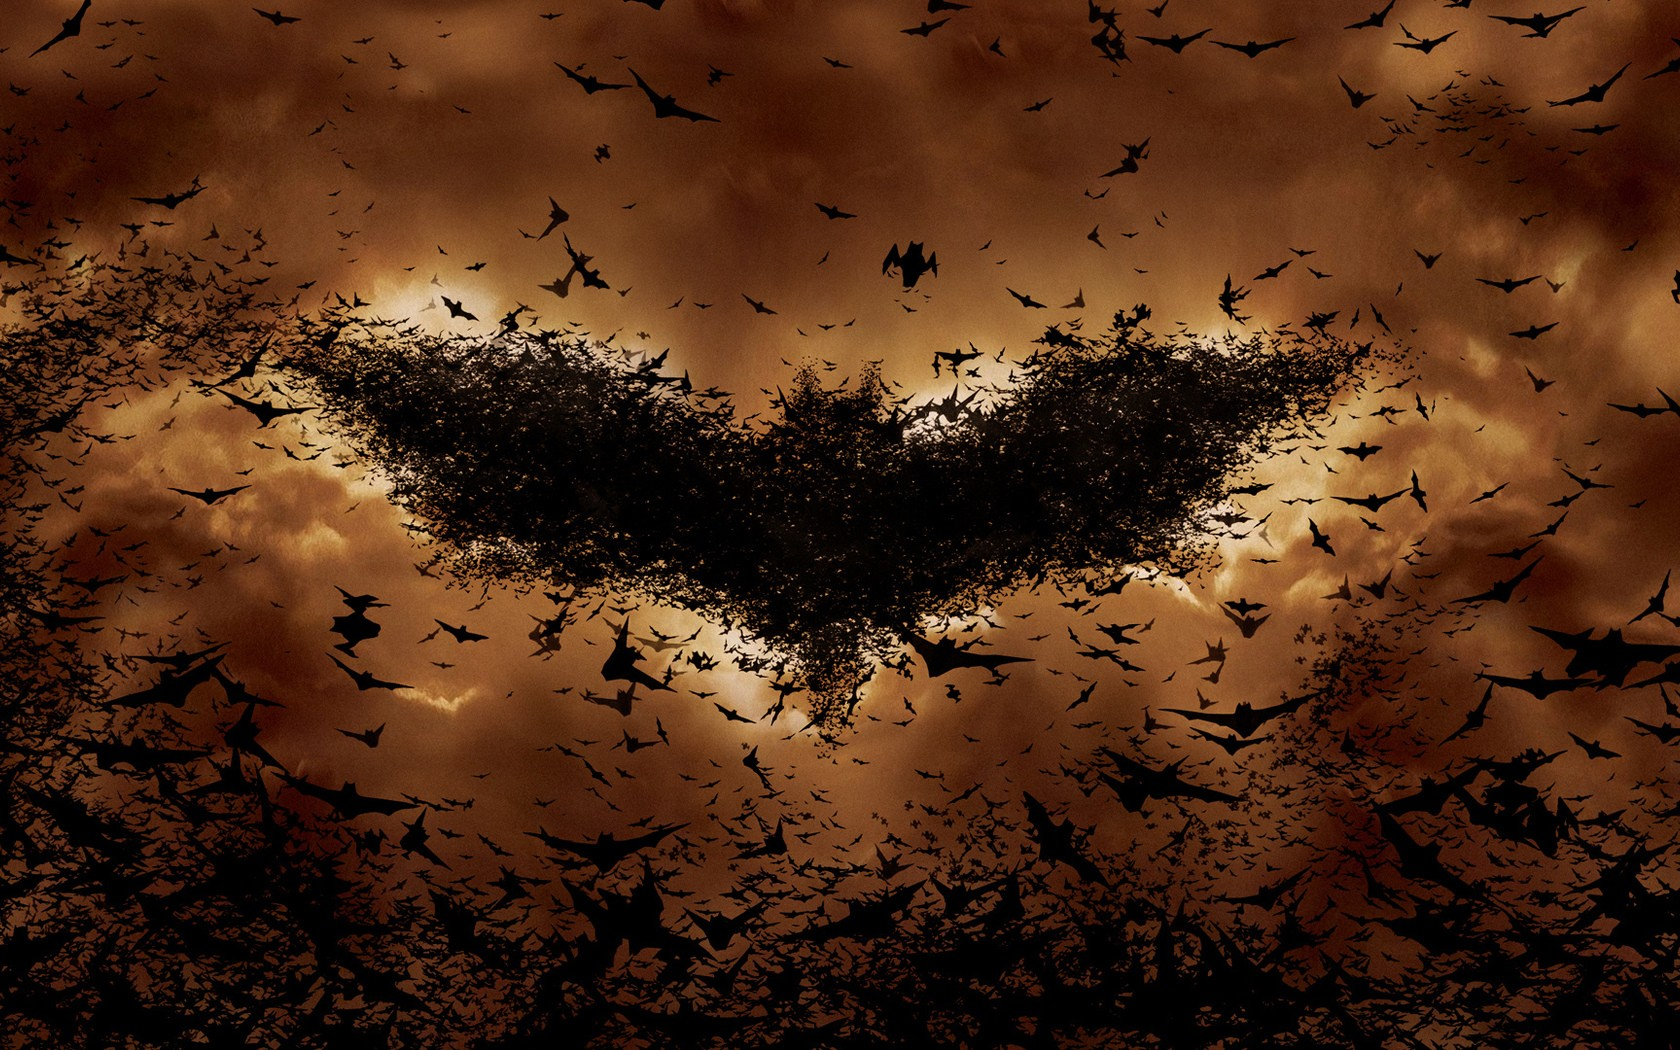 Download Batman Movies Wallpaper 1680x1050 Wallpoper 366726 1680x1050